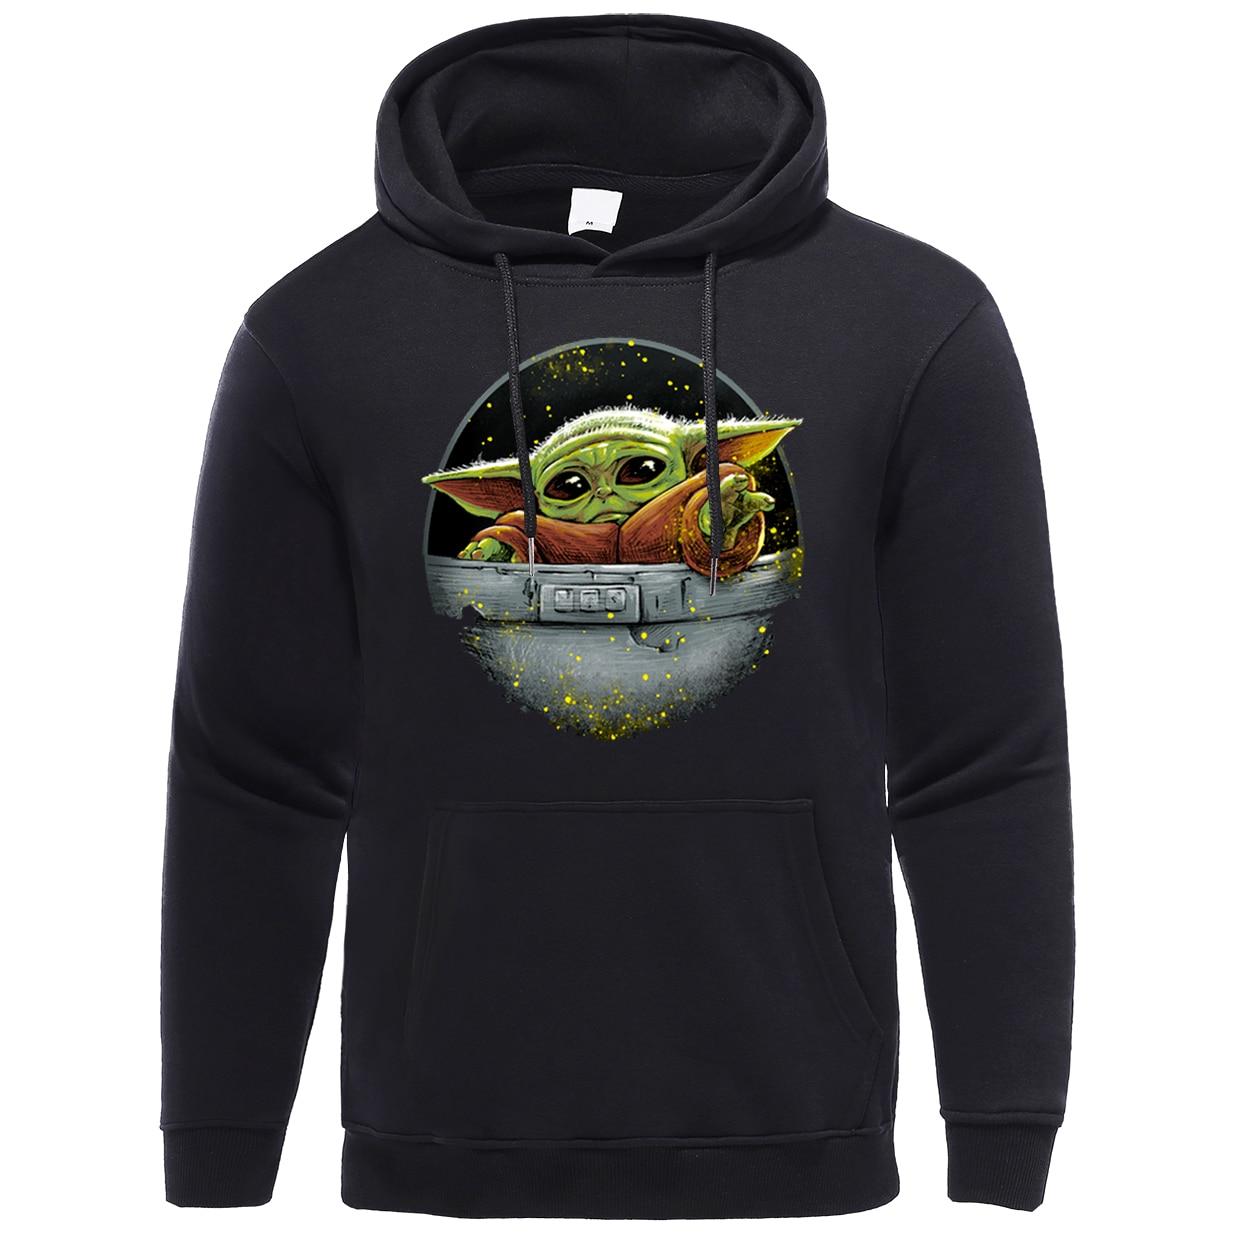 Mandalorian Streetwear Hip Hop  Men Hoodies New Spring Winter 2020 Casual Pullover Fleece Male Baby Yoda Fashion Hooded